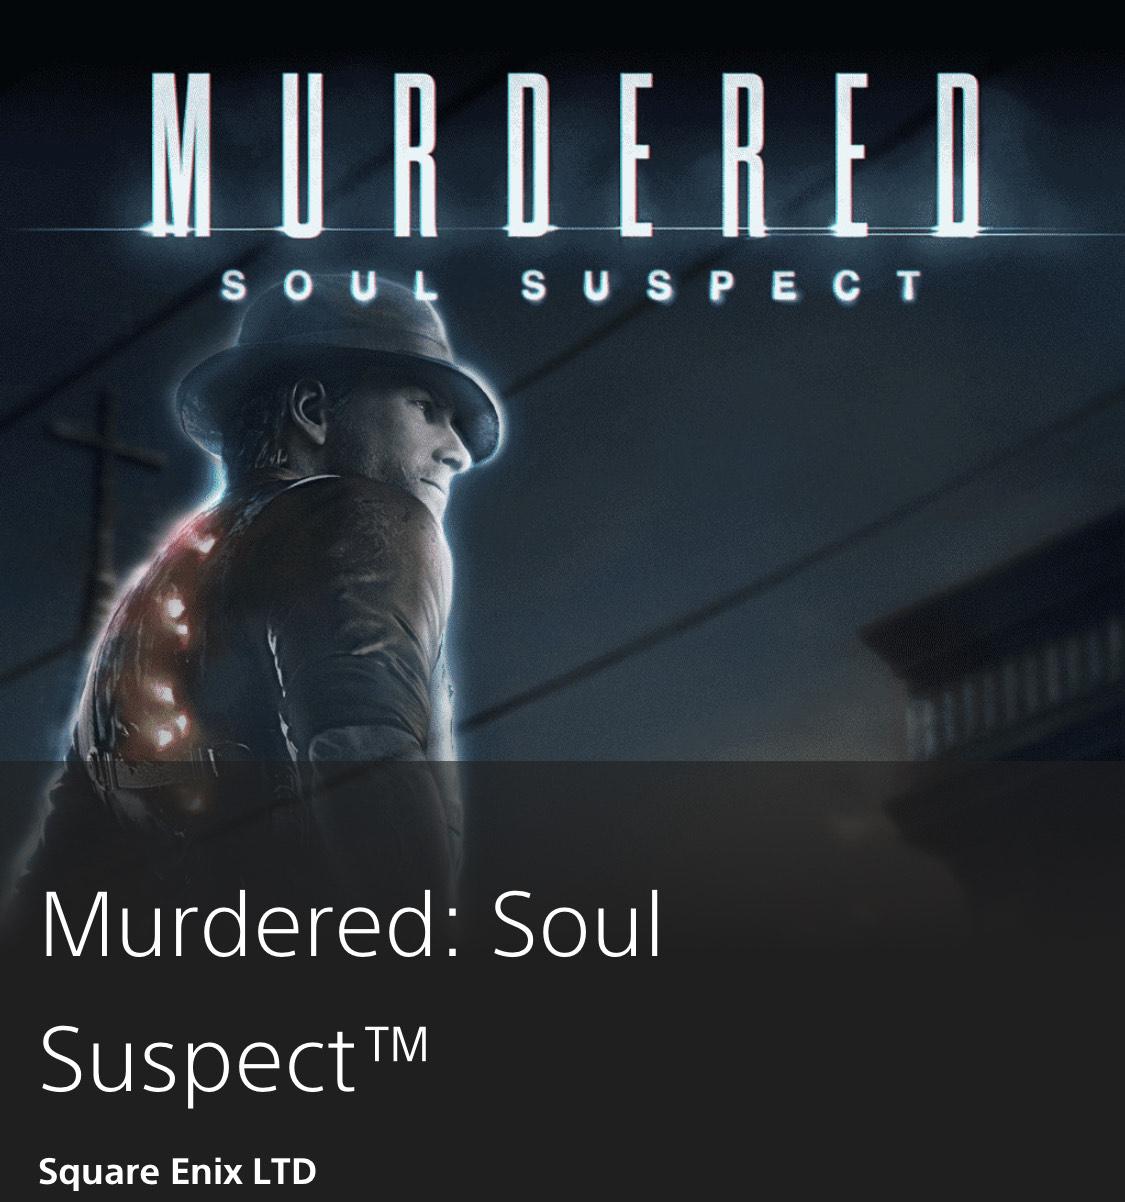 Murdered: Soul Suspect™ | Square Enix LTD